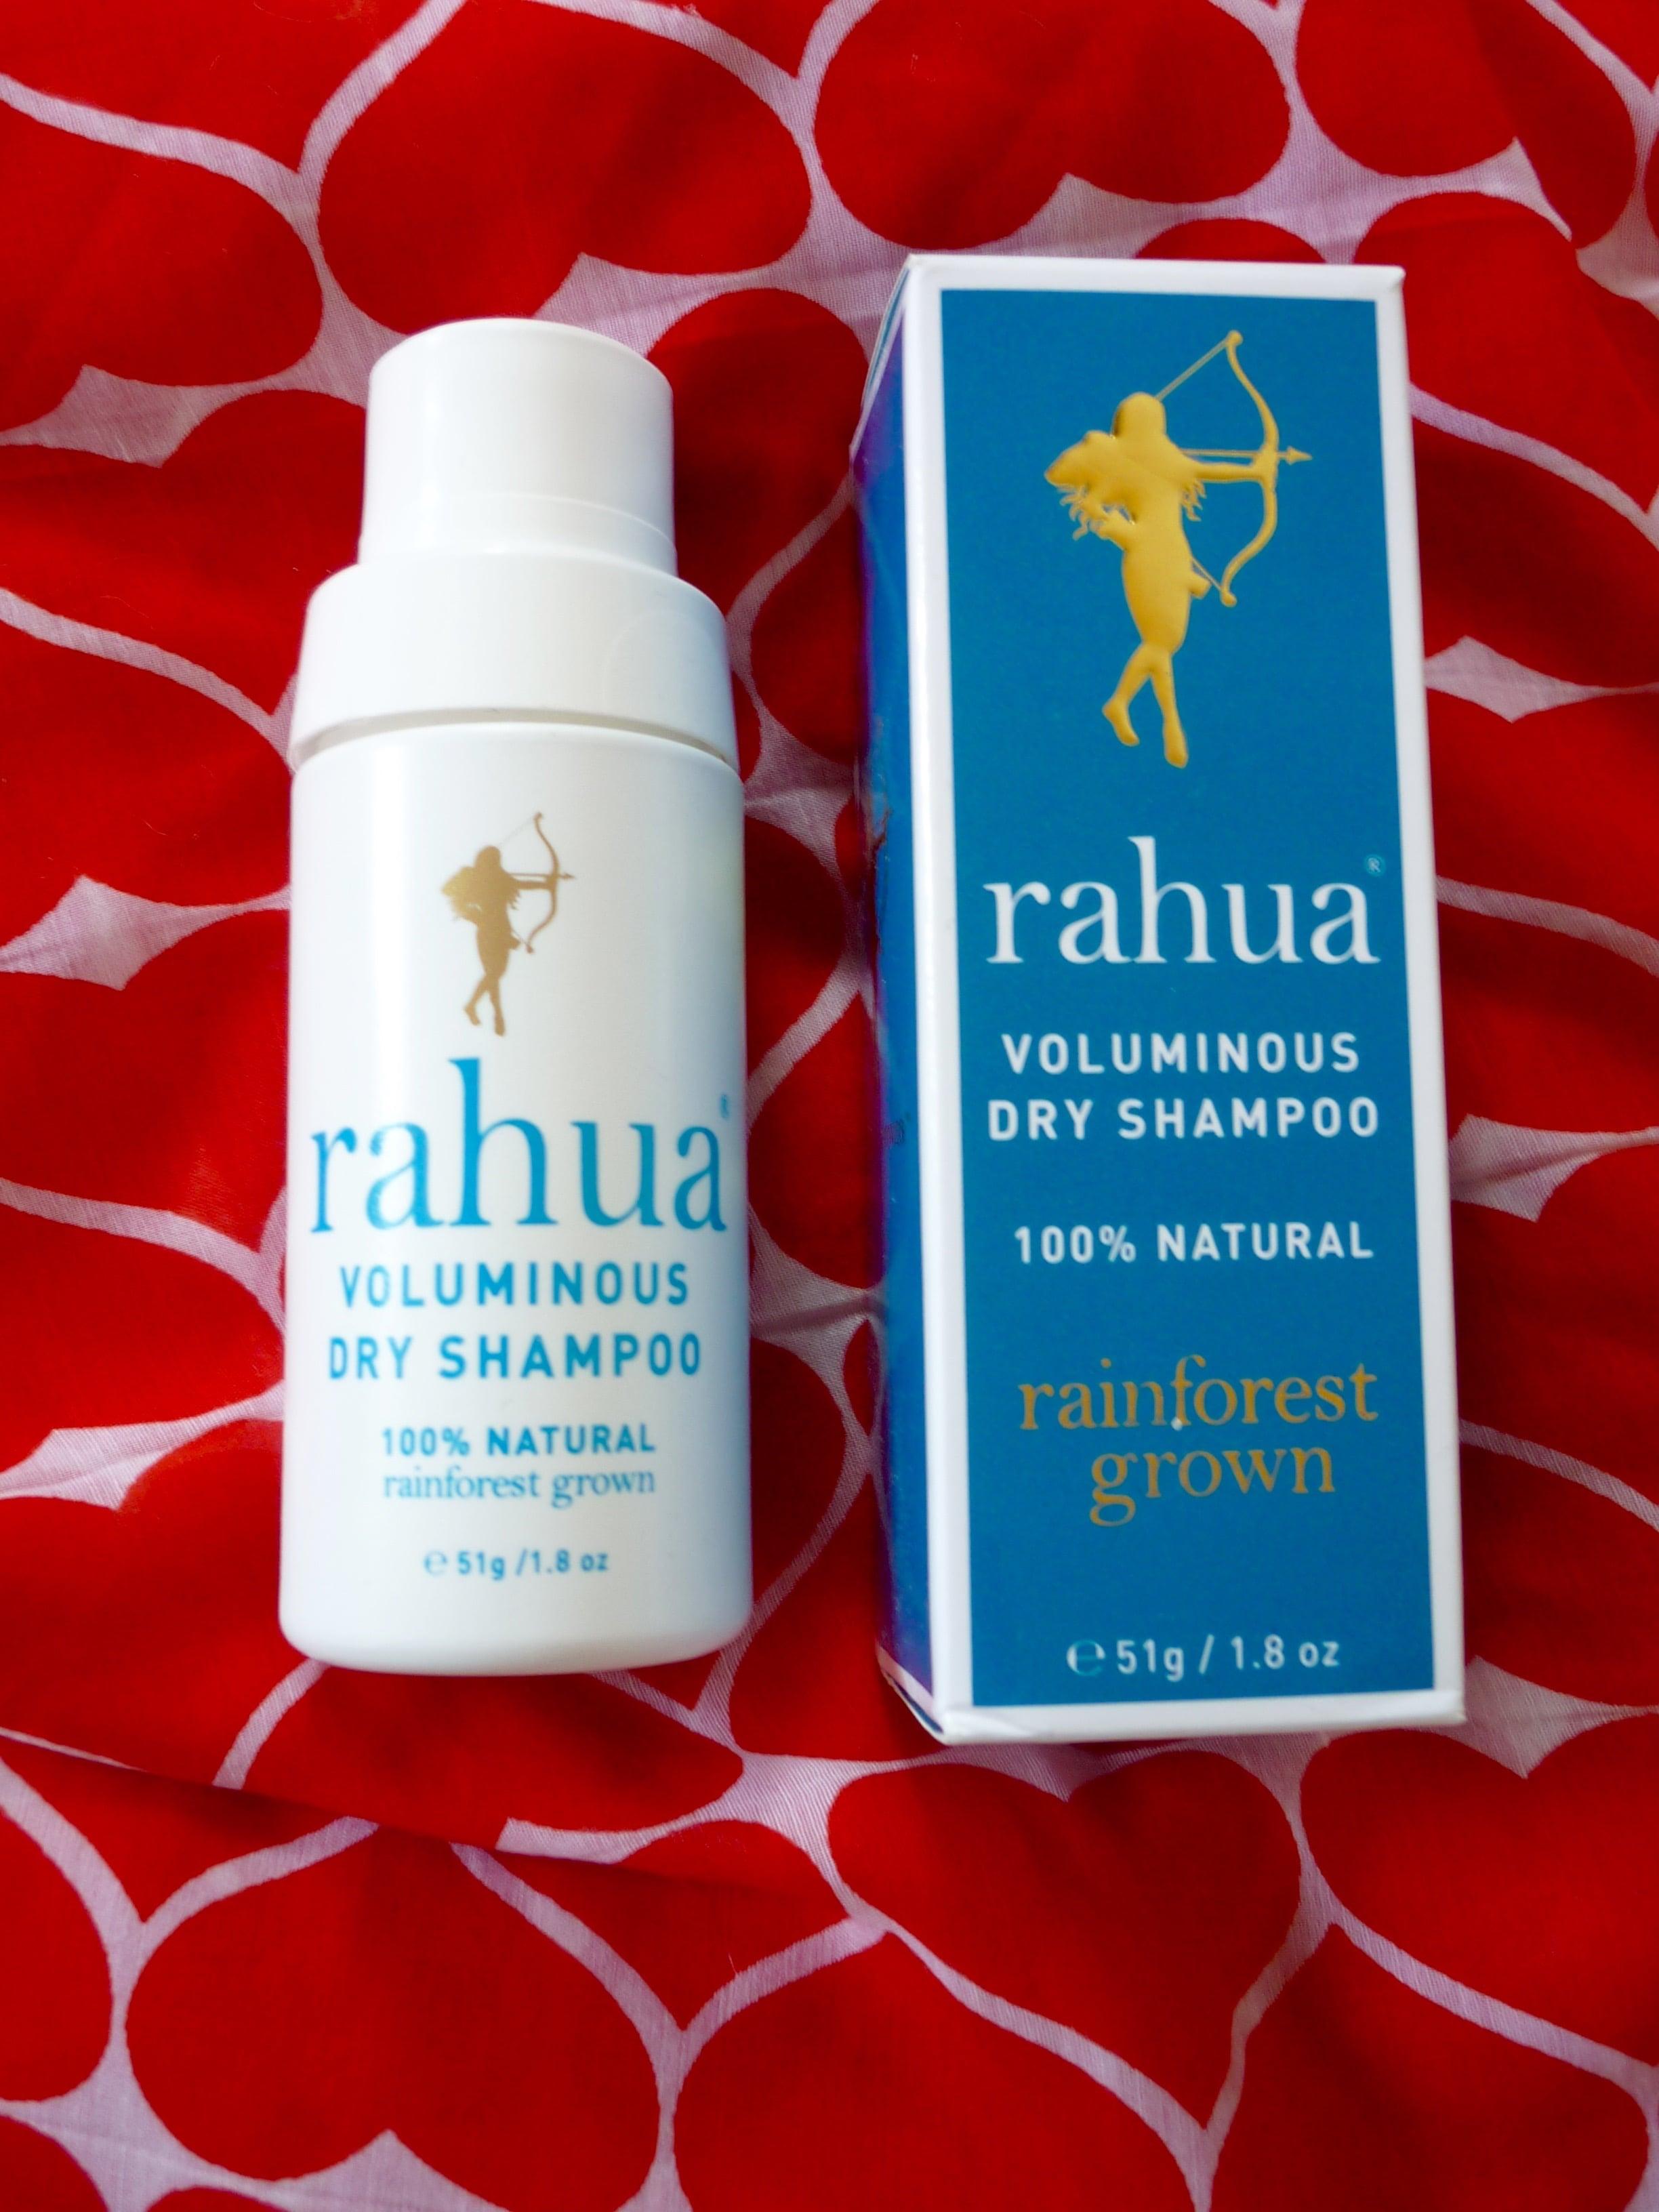 Shampoing sec Rahua